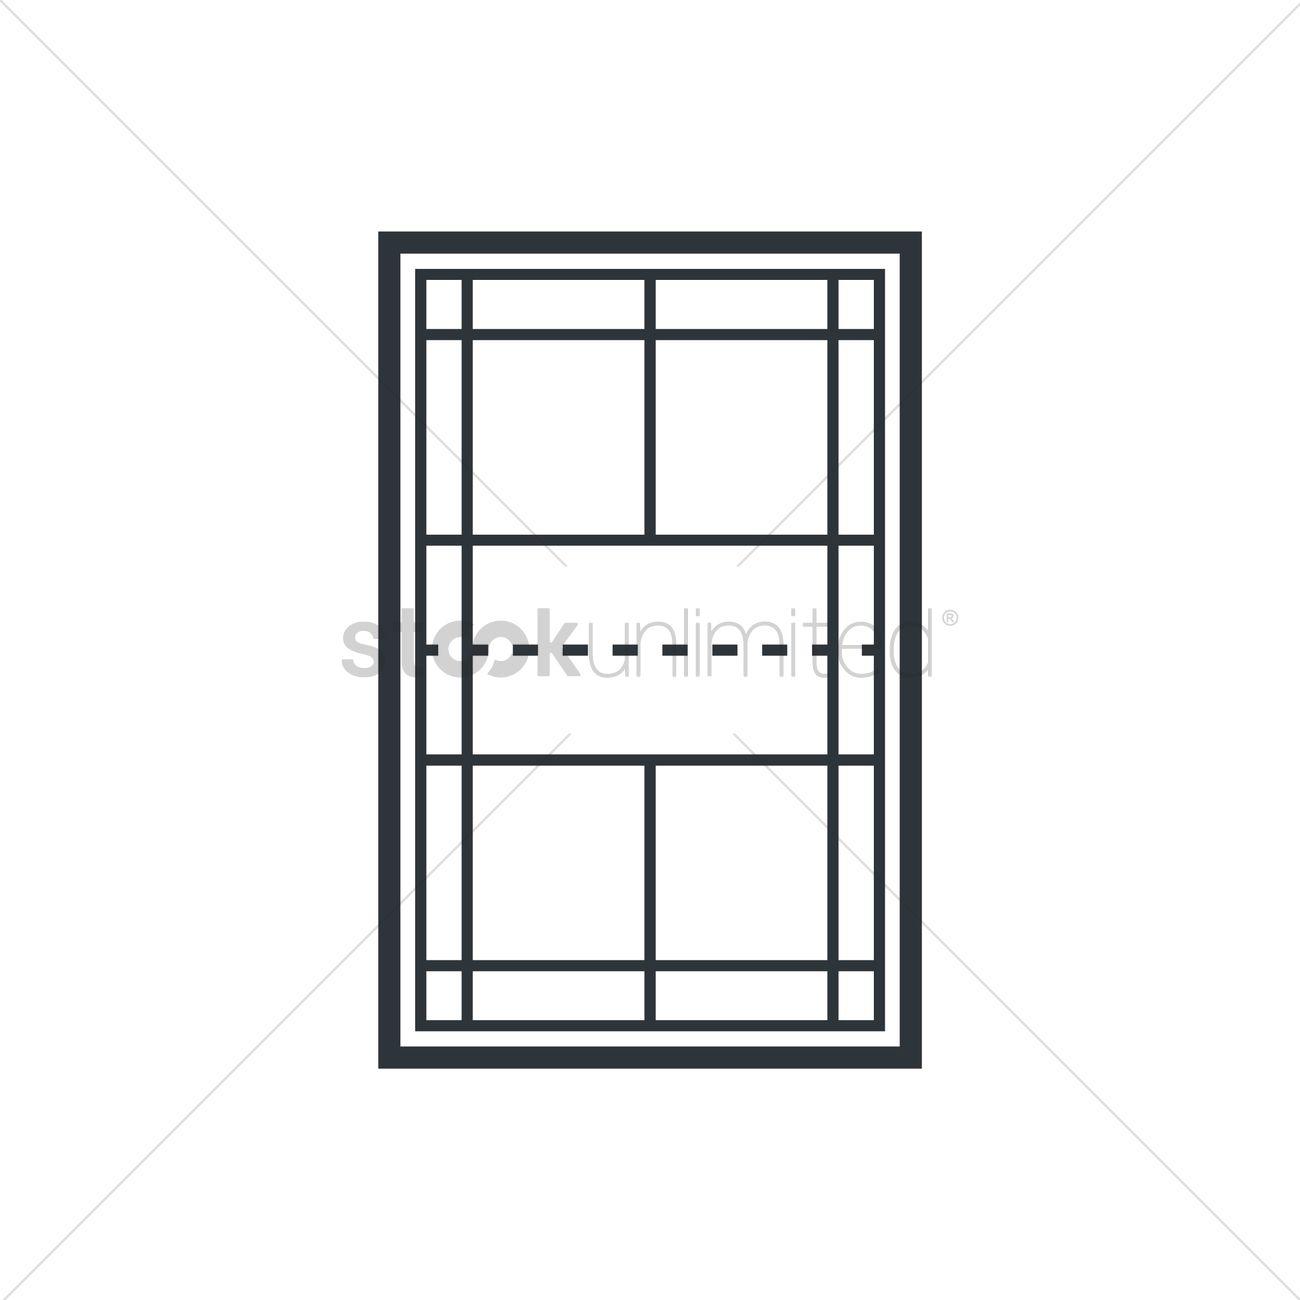 1300x1300 Badminton Court Vector Image